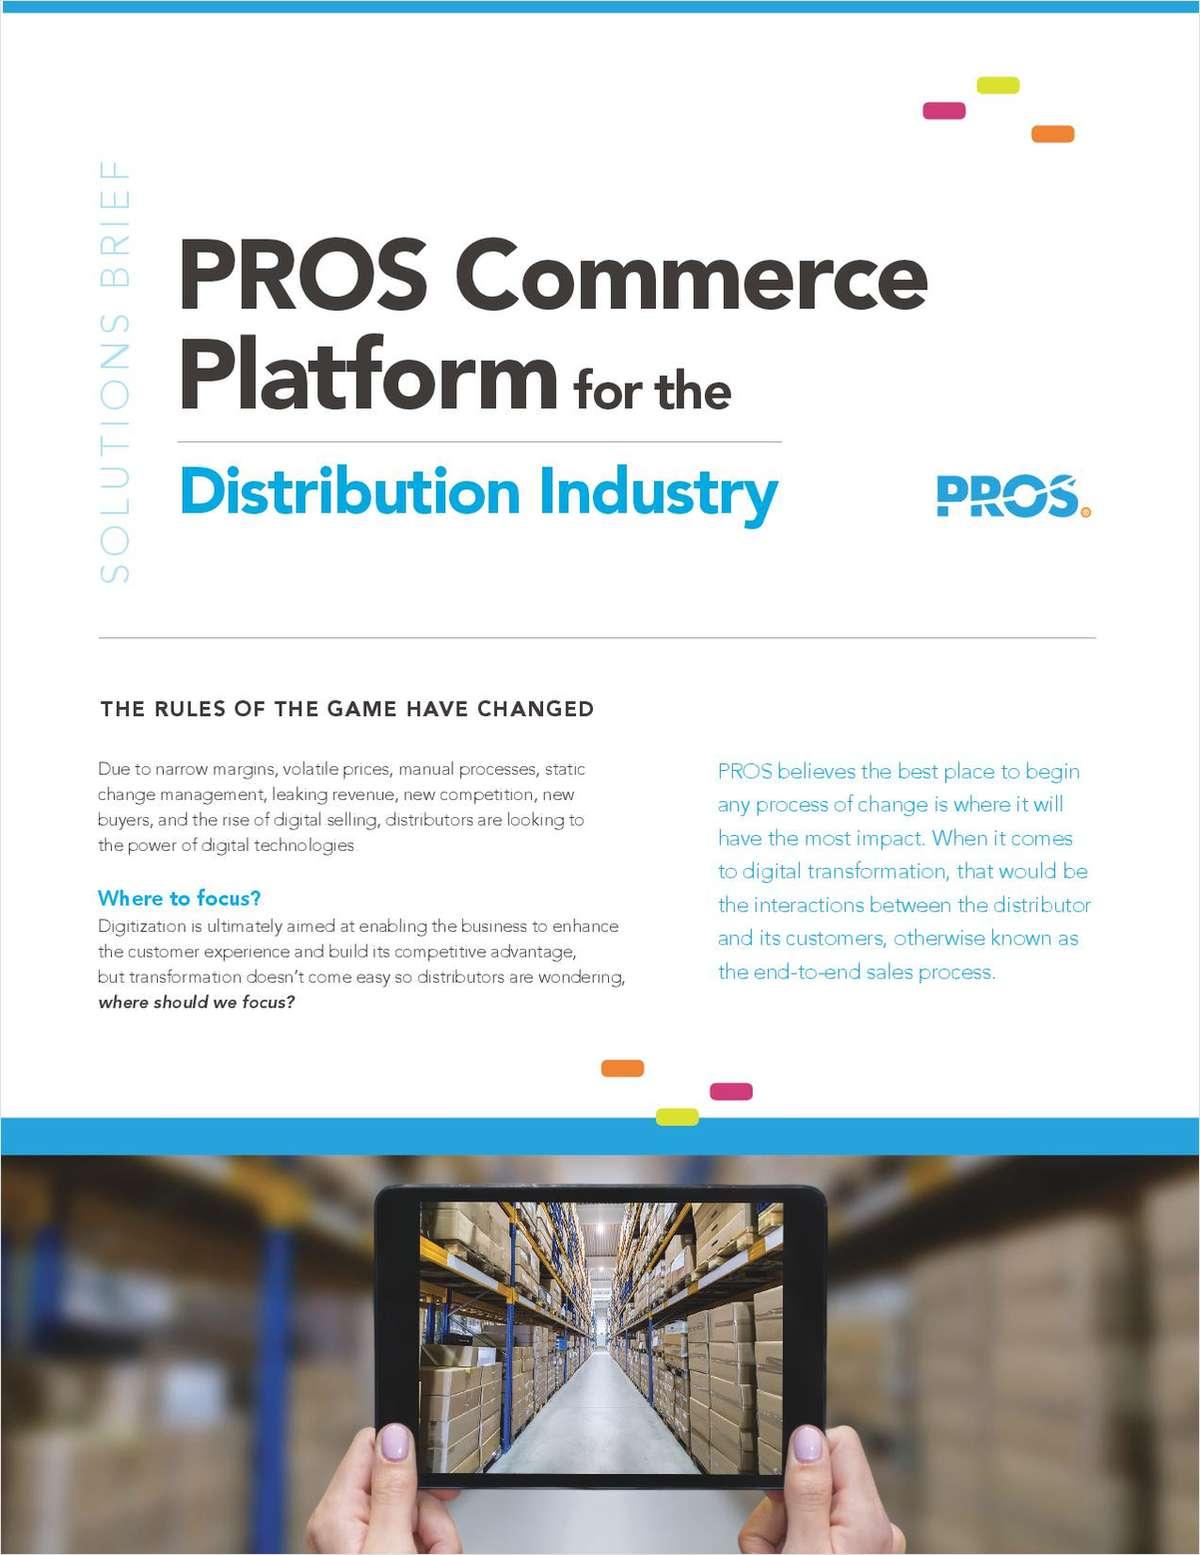 PROS Commerce Platform for the Distribution Industry